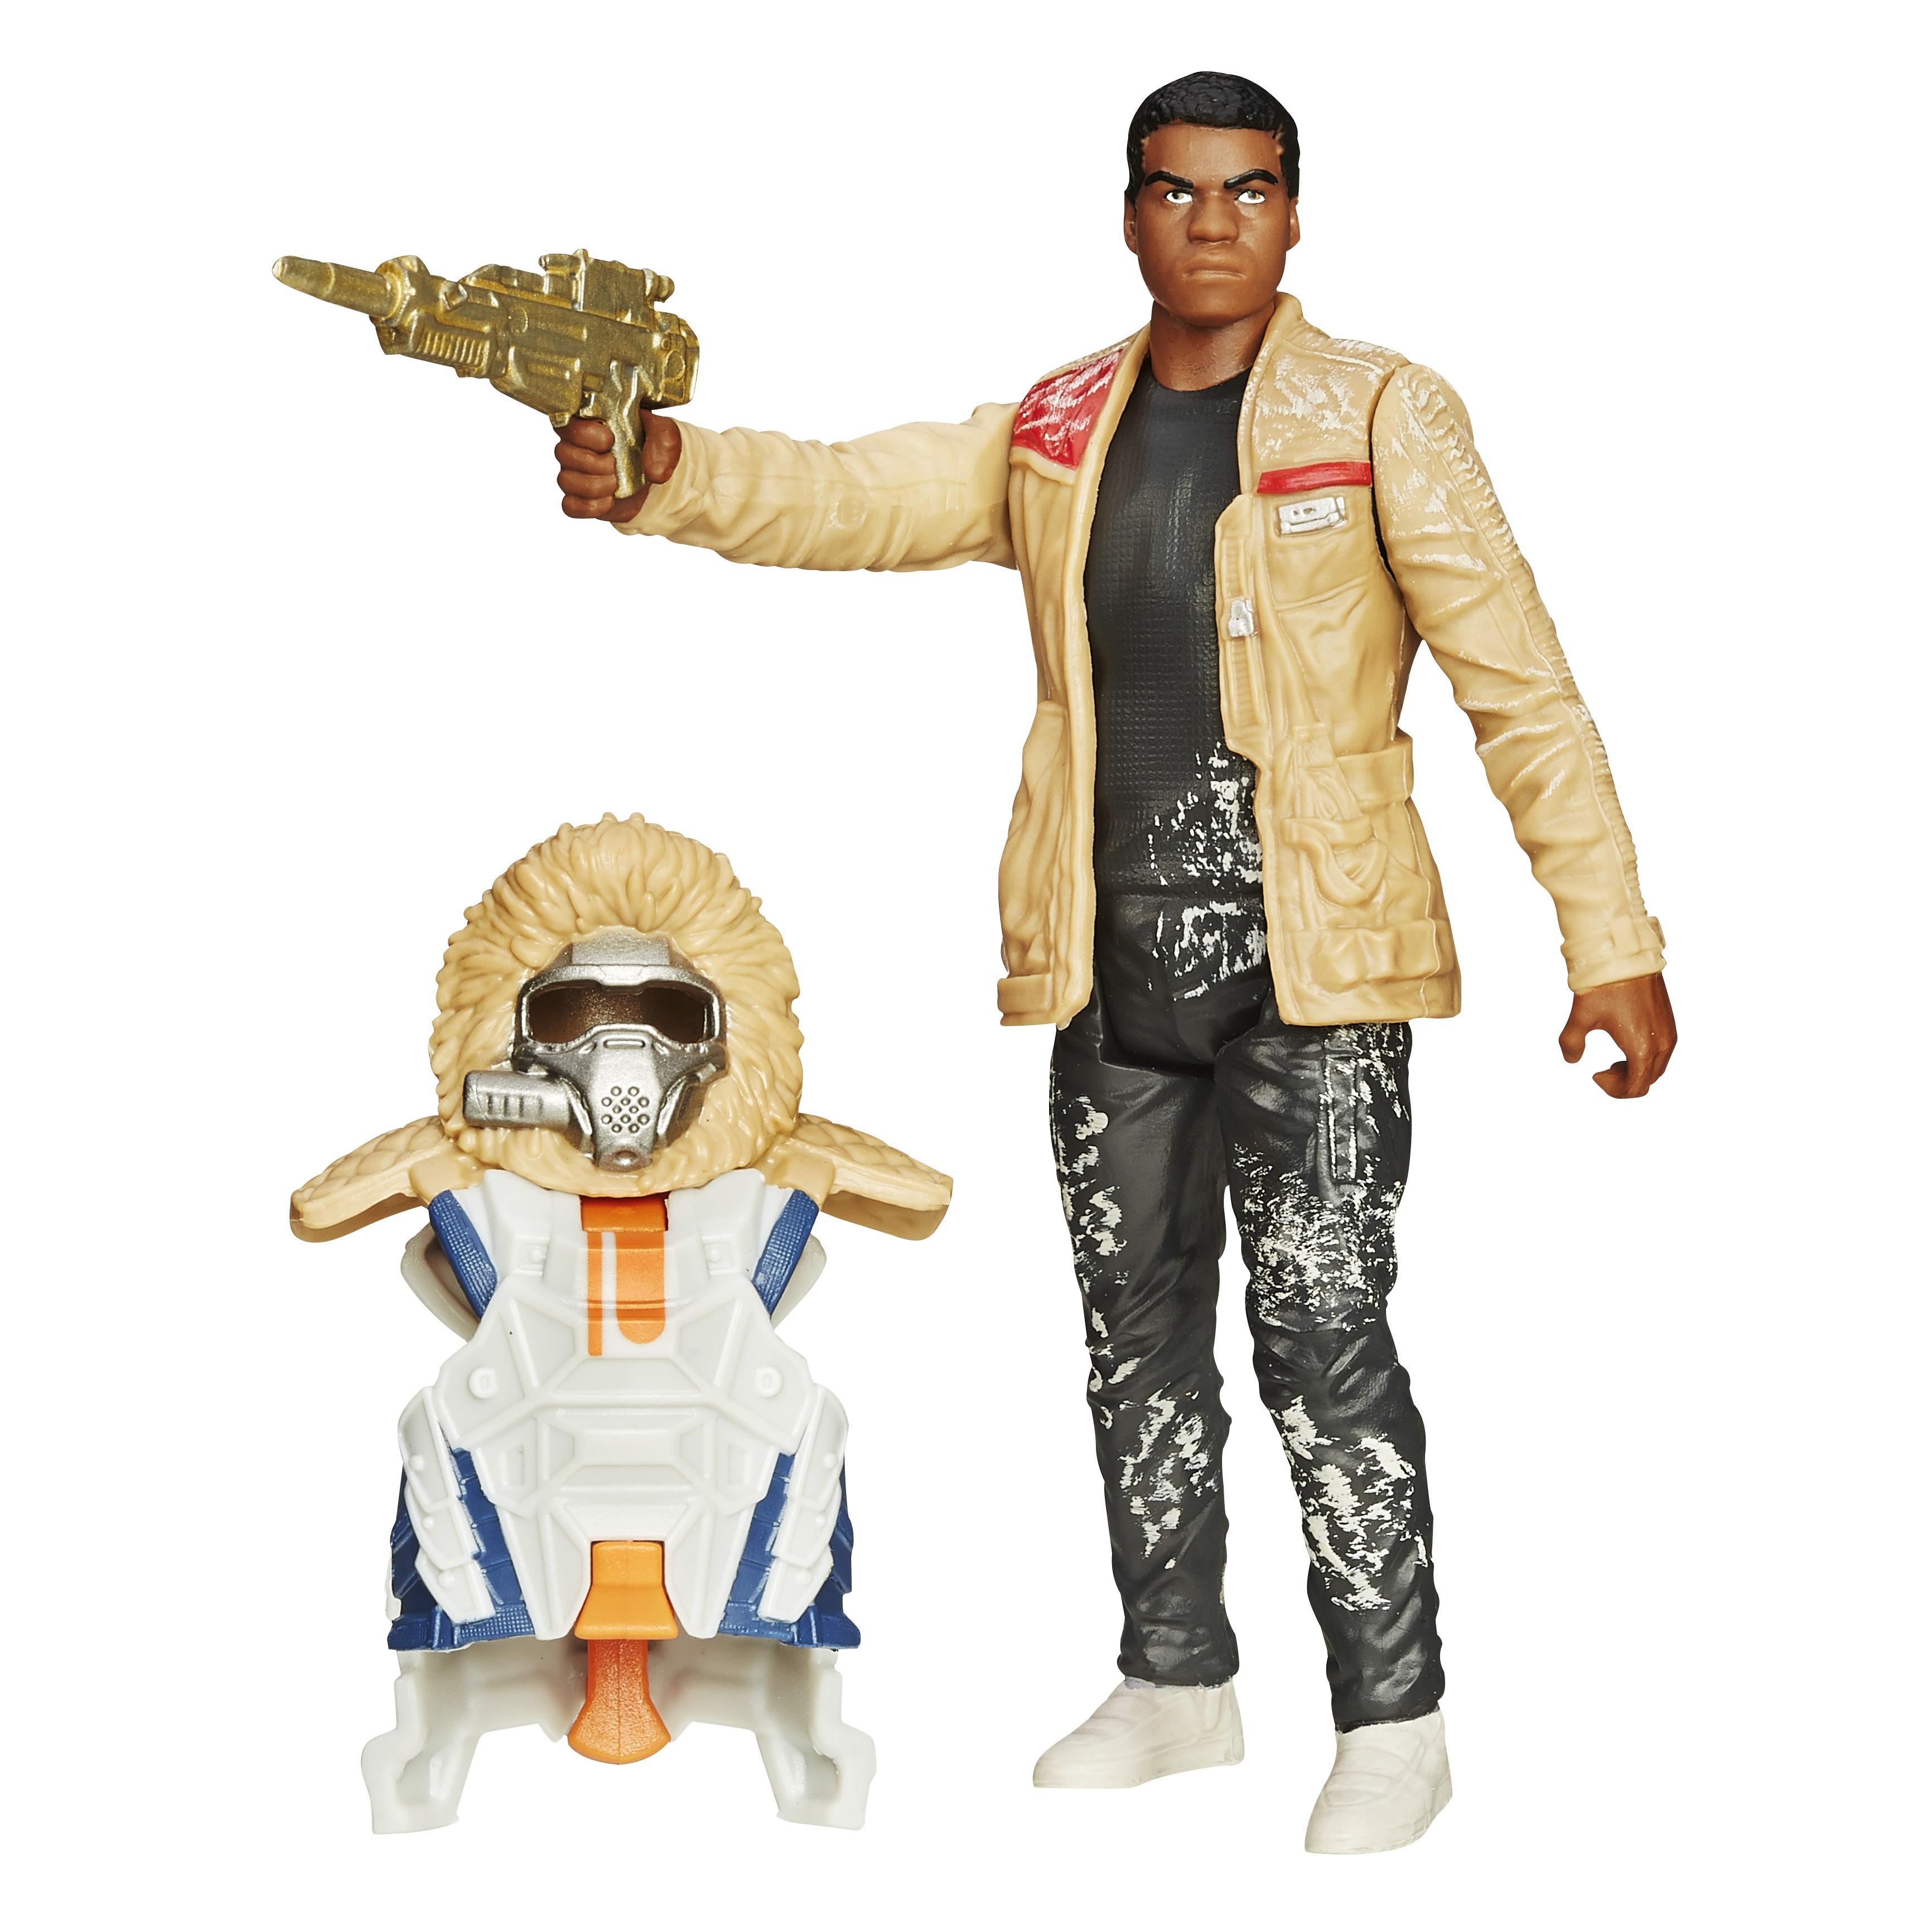 <b>Star Wars <i>The Force Awakens</i> Armor Up</b>; Finn